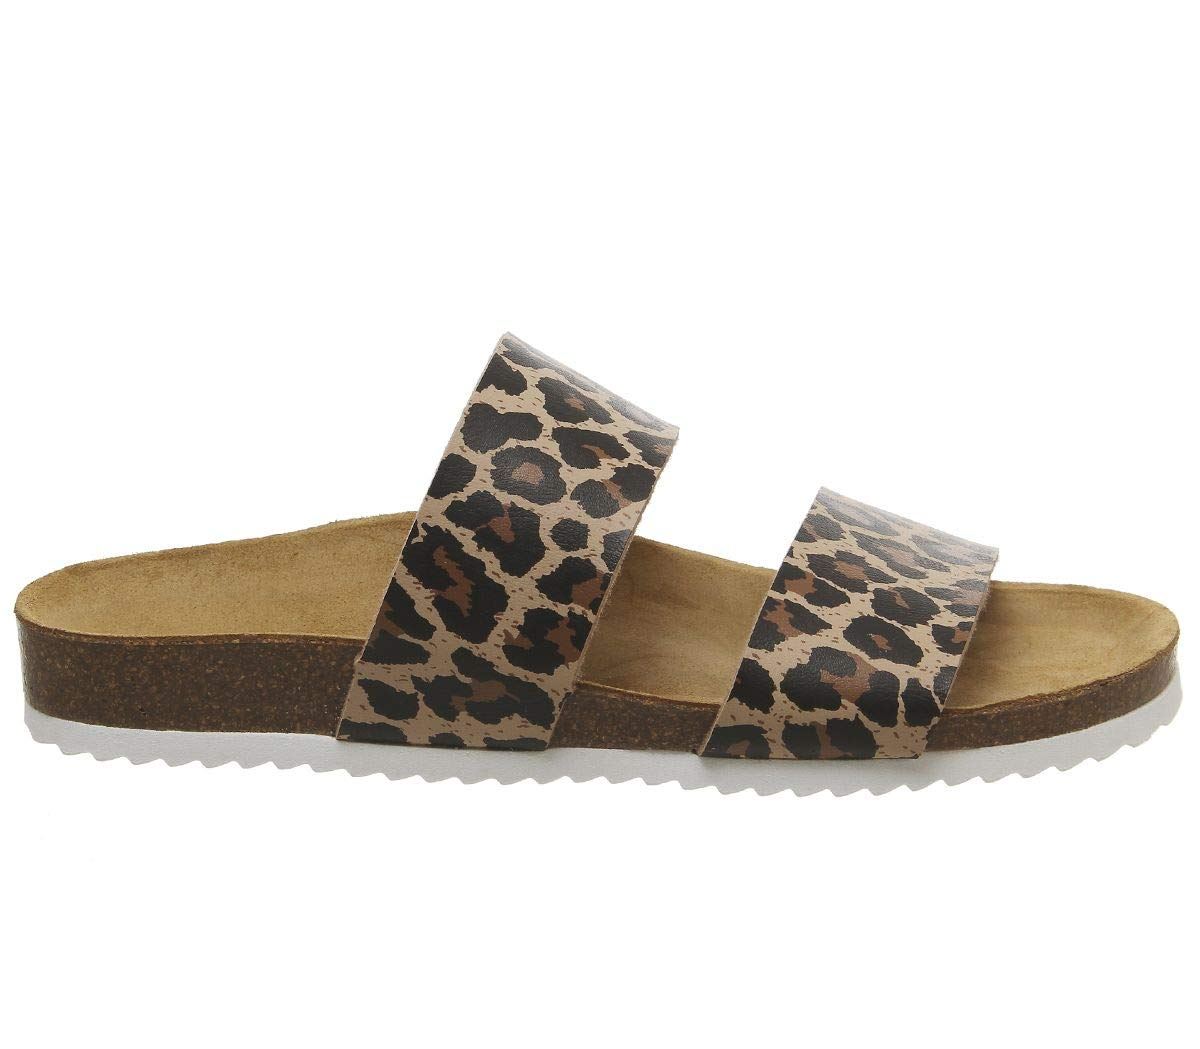 Womens Office Oslo 2 Sandals New Leopard Print Sandals